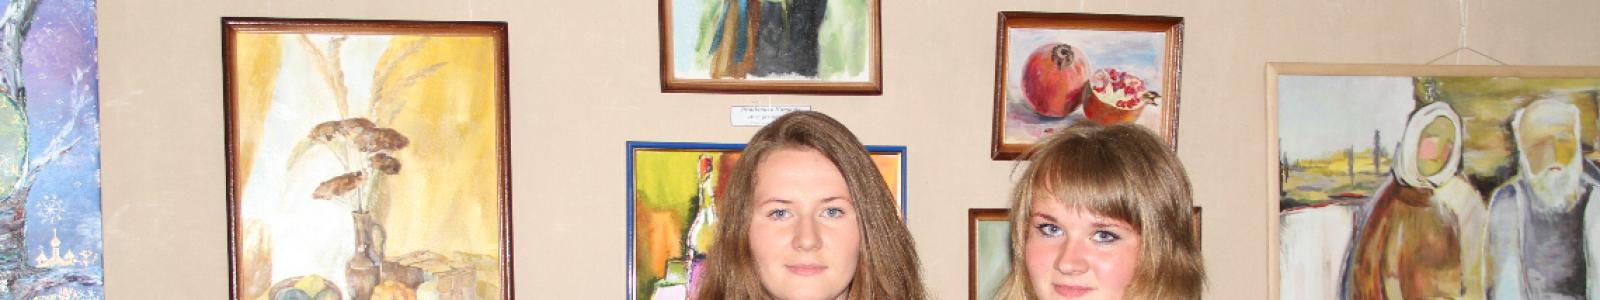 Gallery Painter Natalia Reznichenko